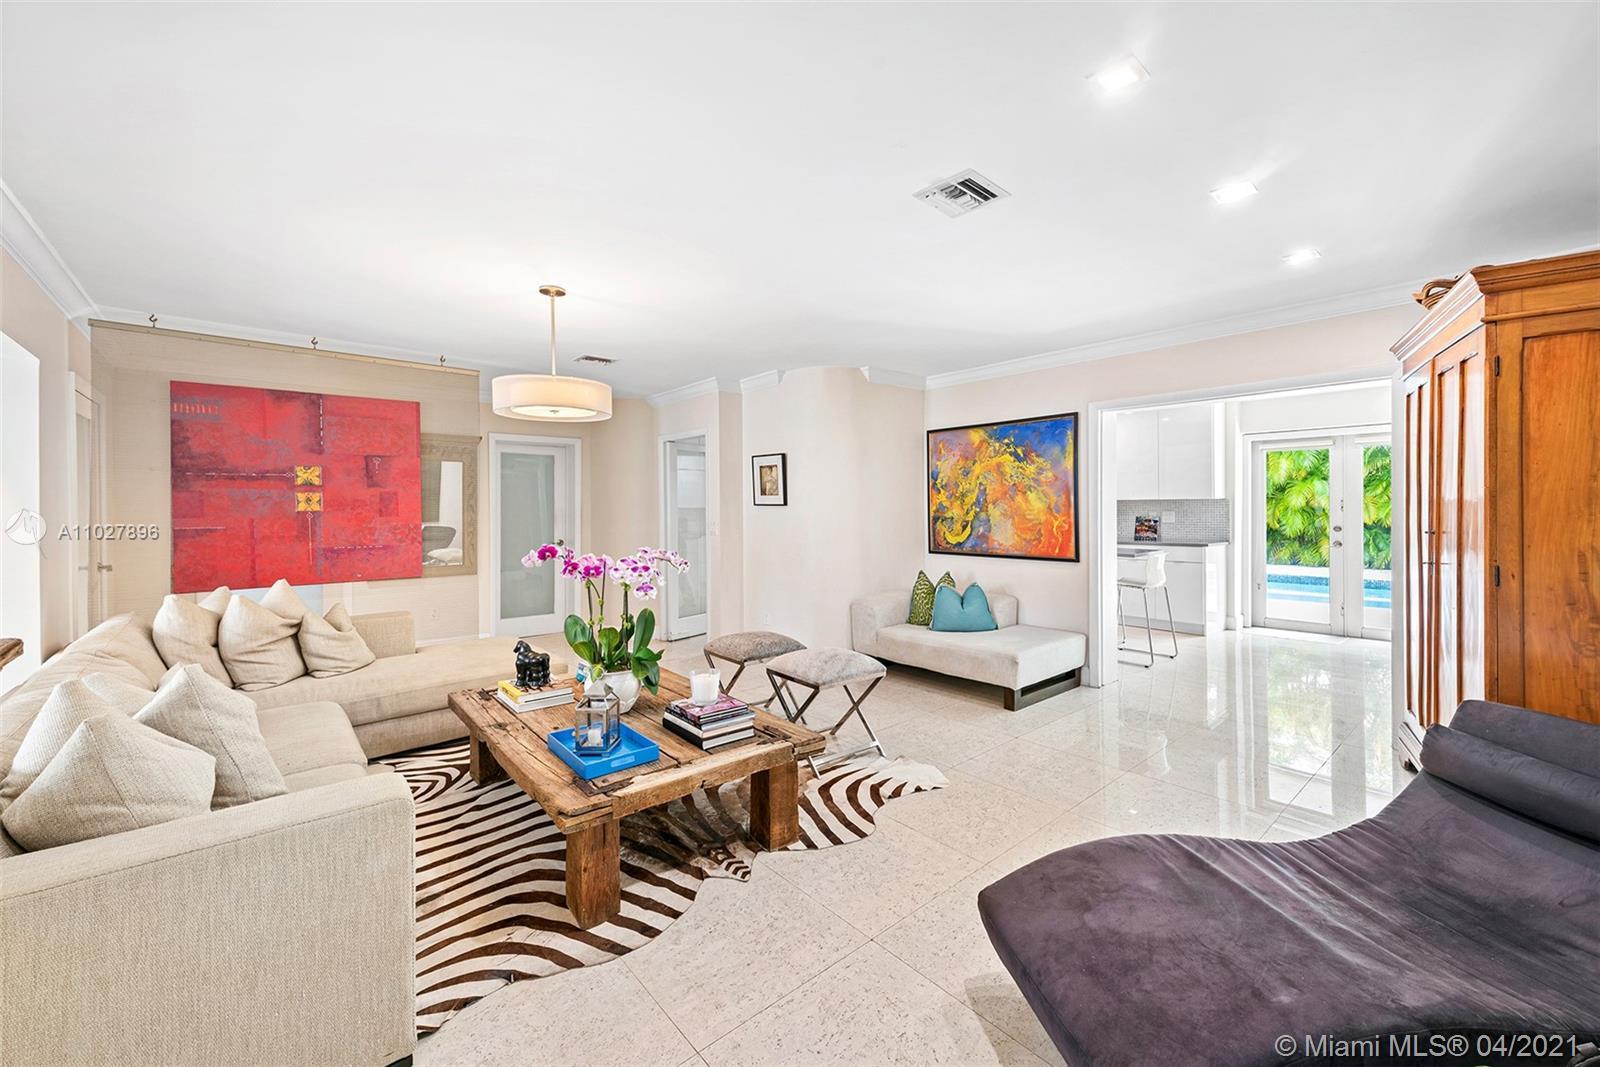 Tropical Isle Homes - 561 Allendale Rd, Key Biscayne, FL 33149